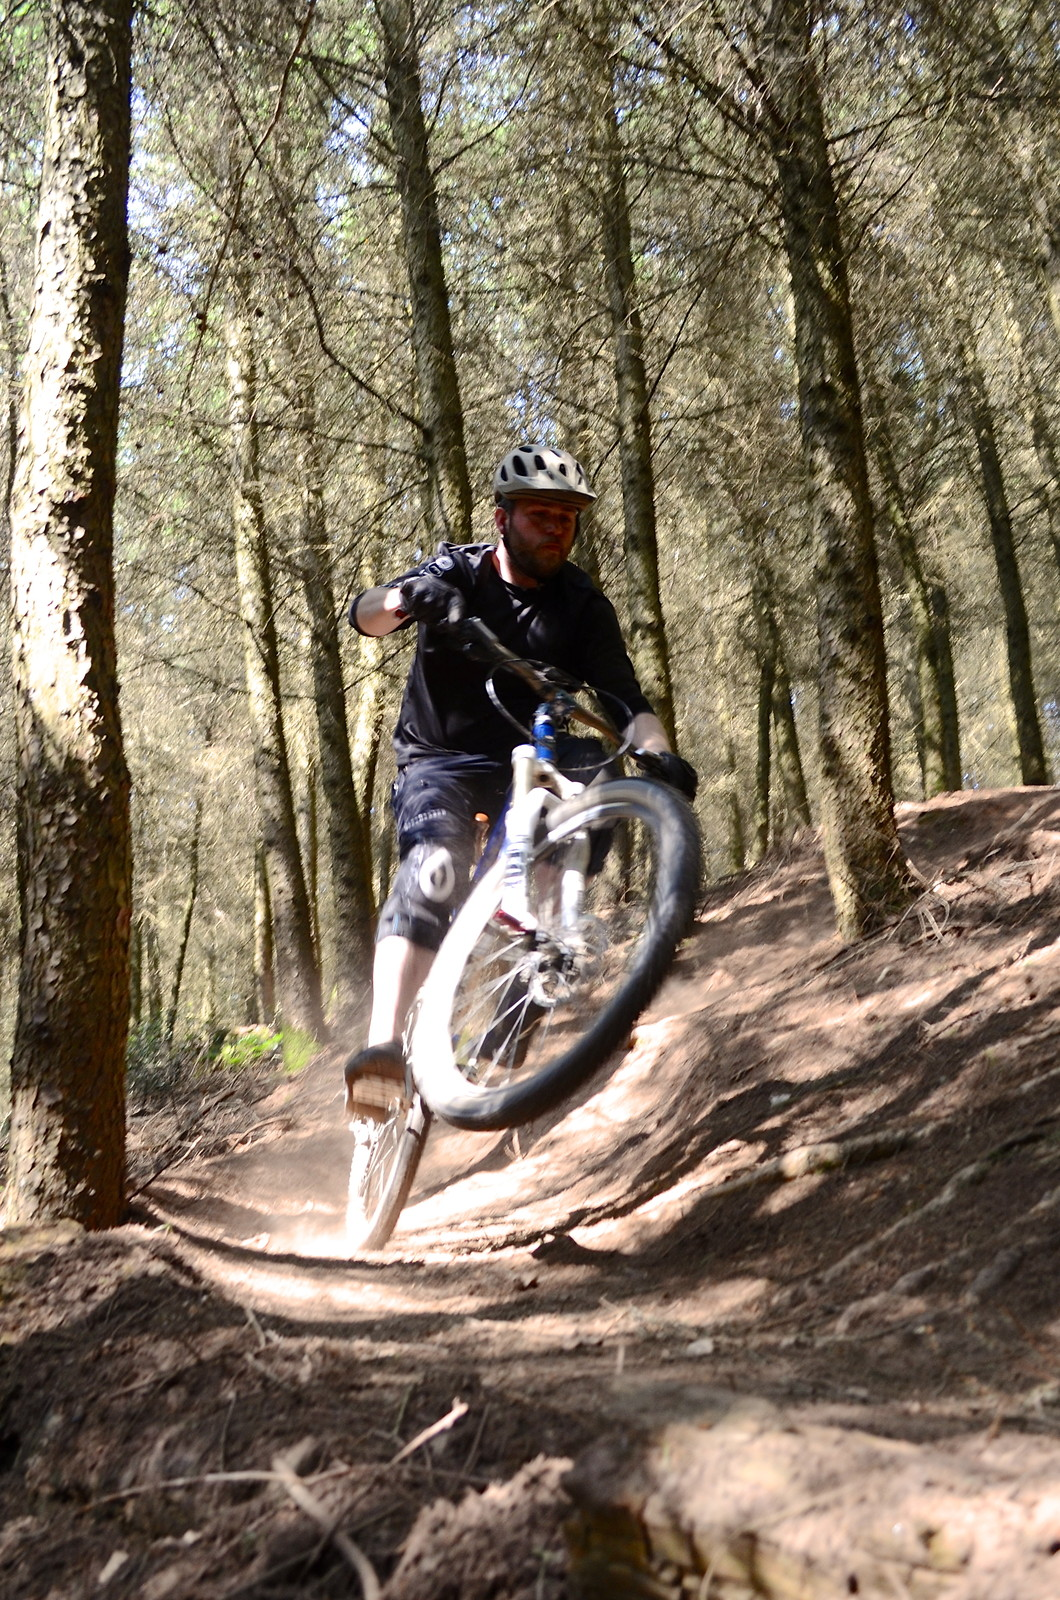 Russ Poppin Corner - adam.pagett - Mountain Biking Pictures - Vital MTB